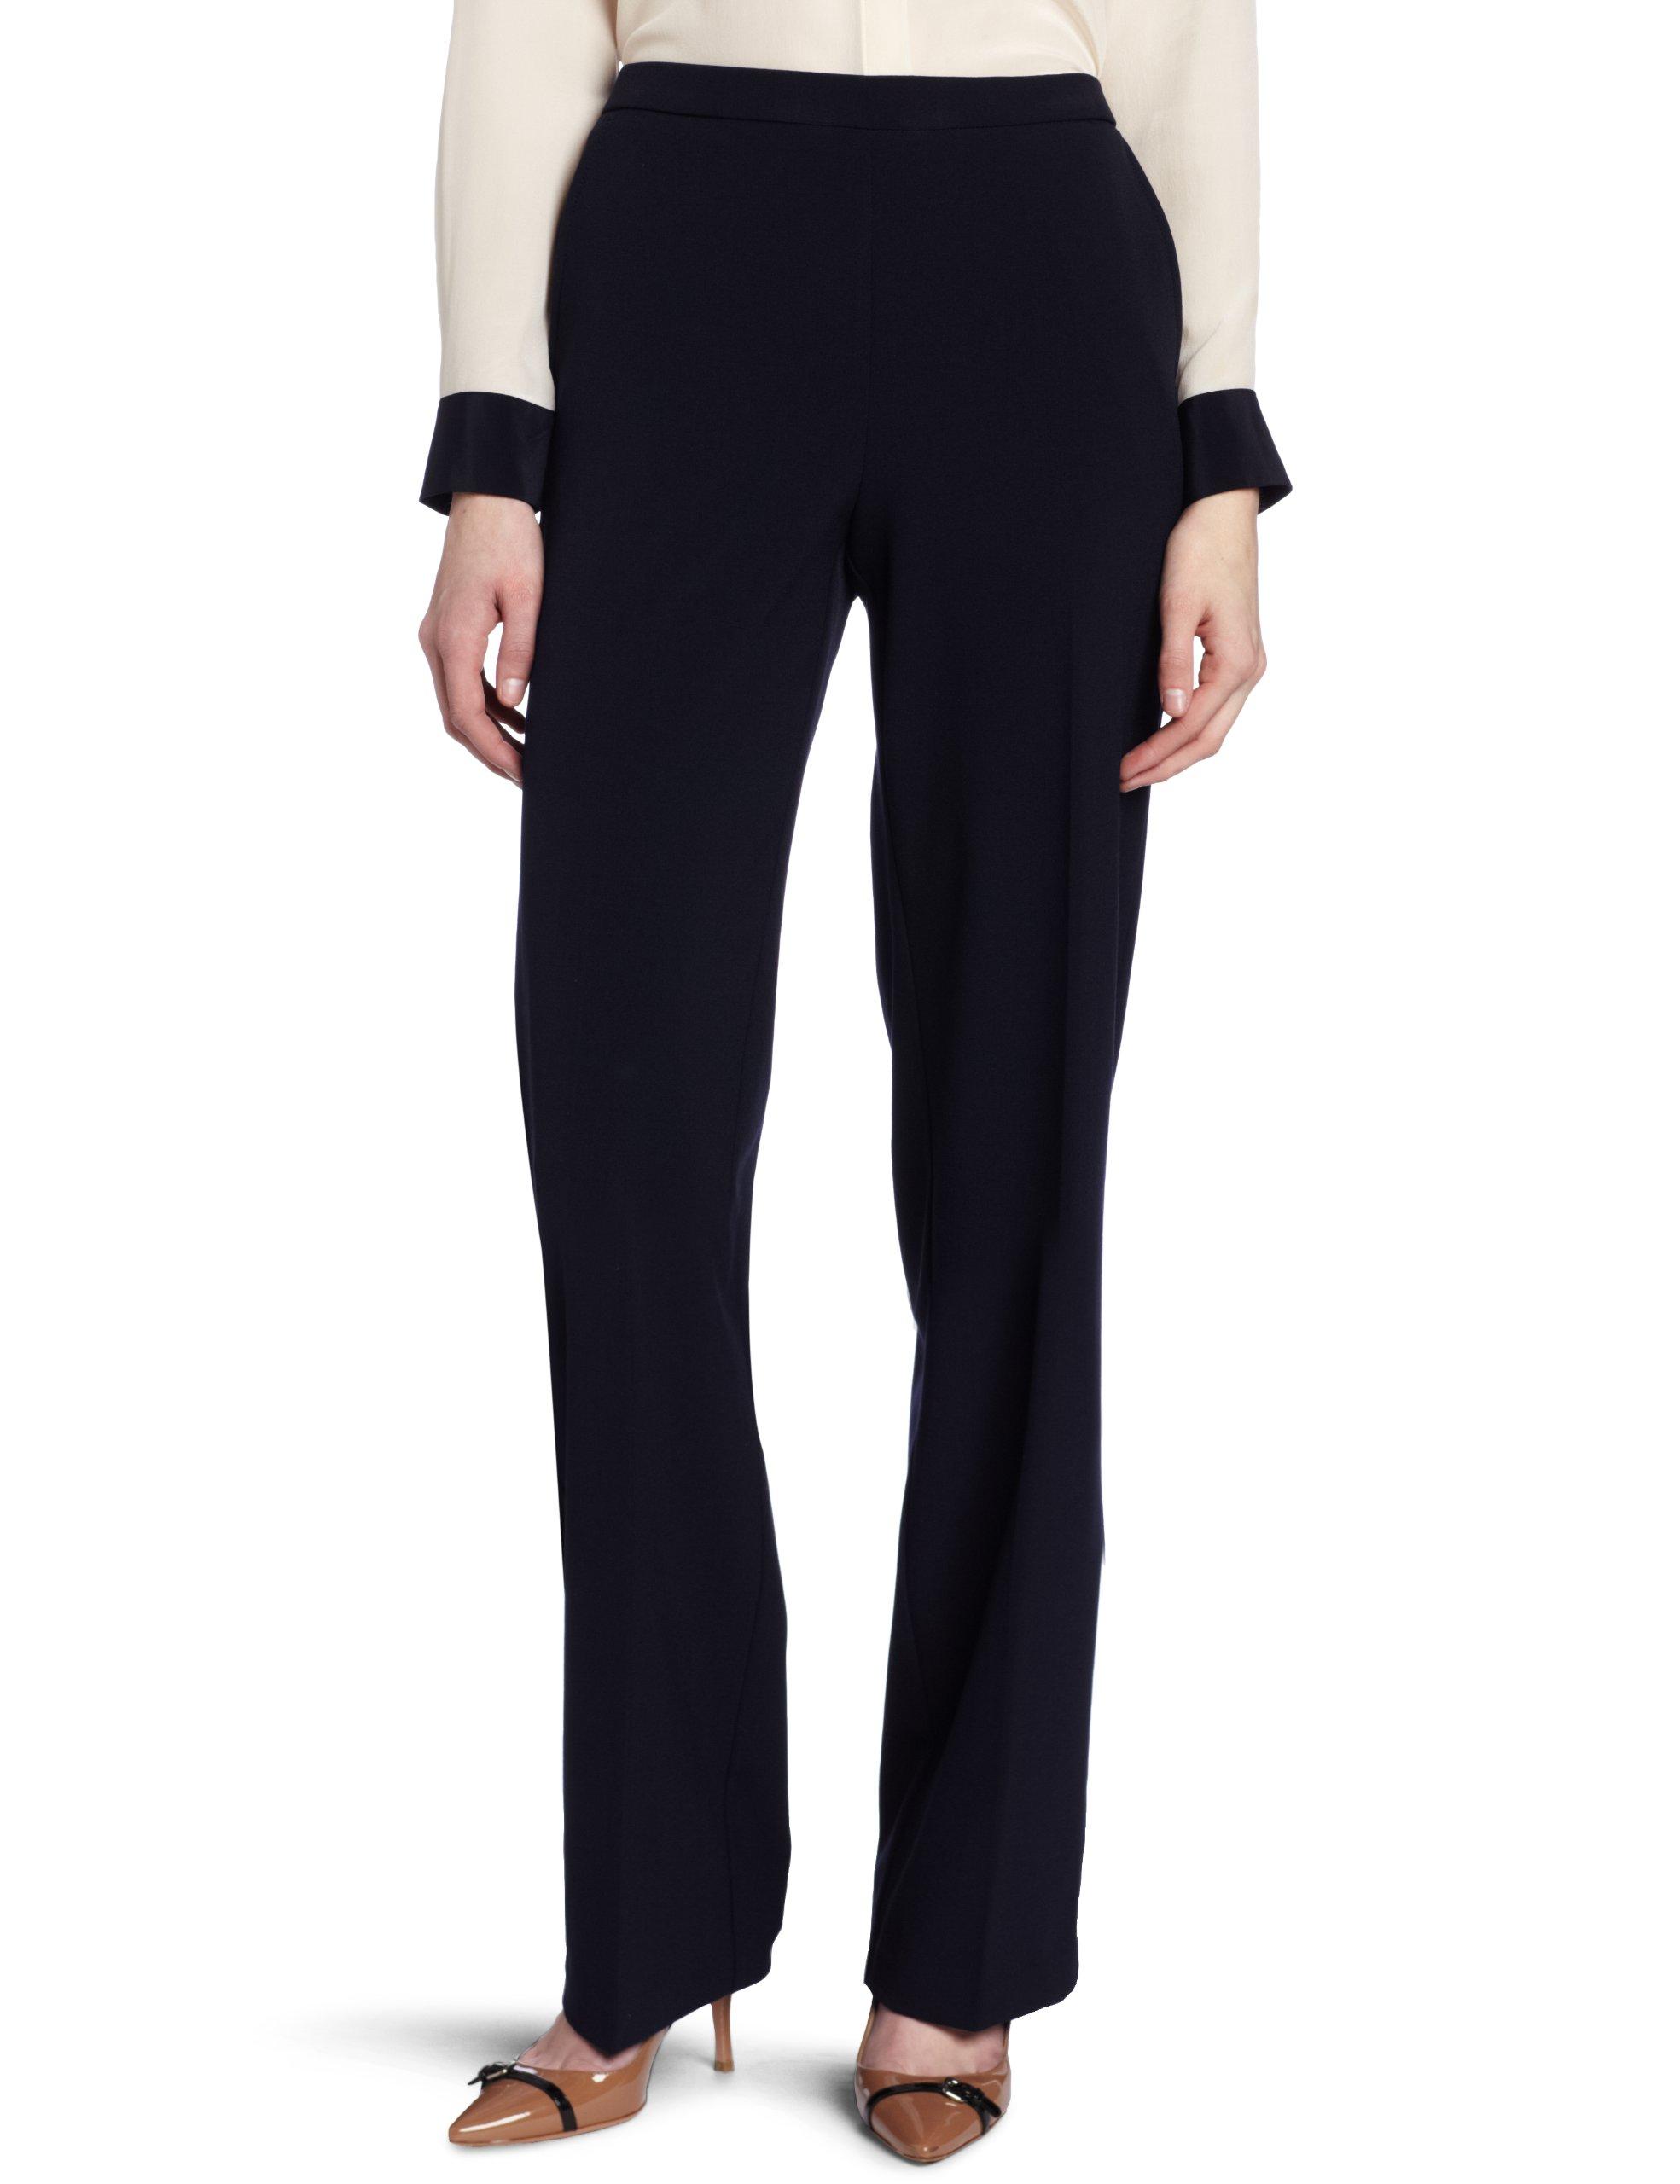 Briggs New York Women's Short Flat Front Pant, Navy, 16